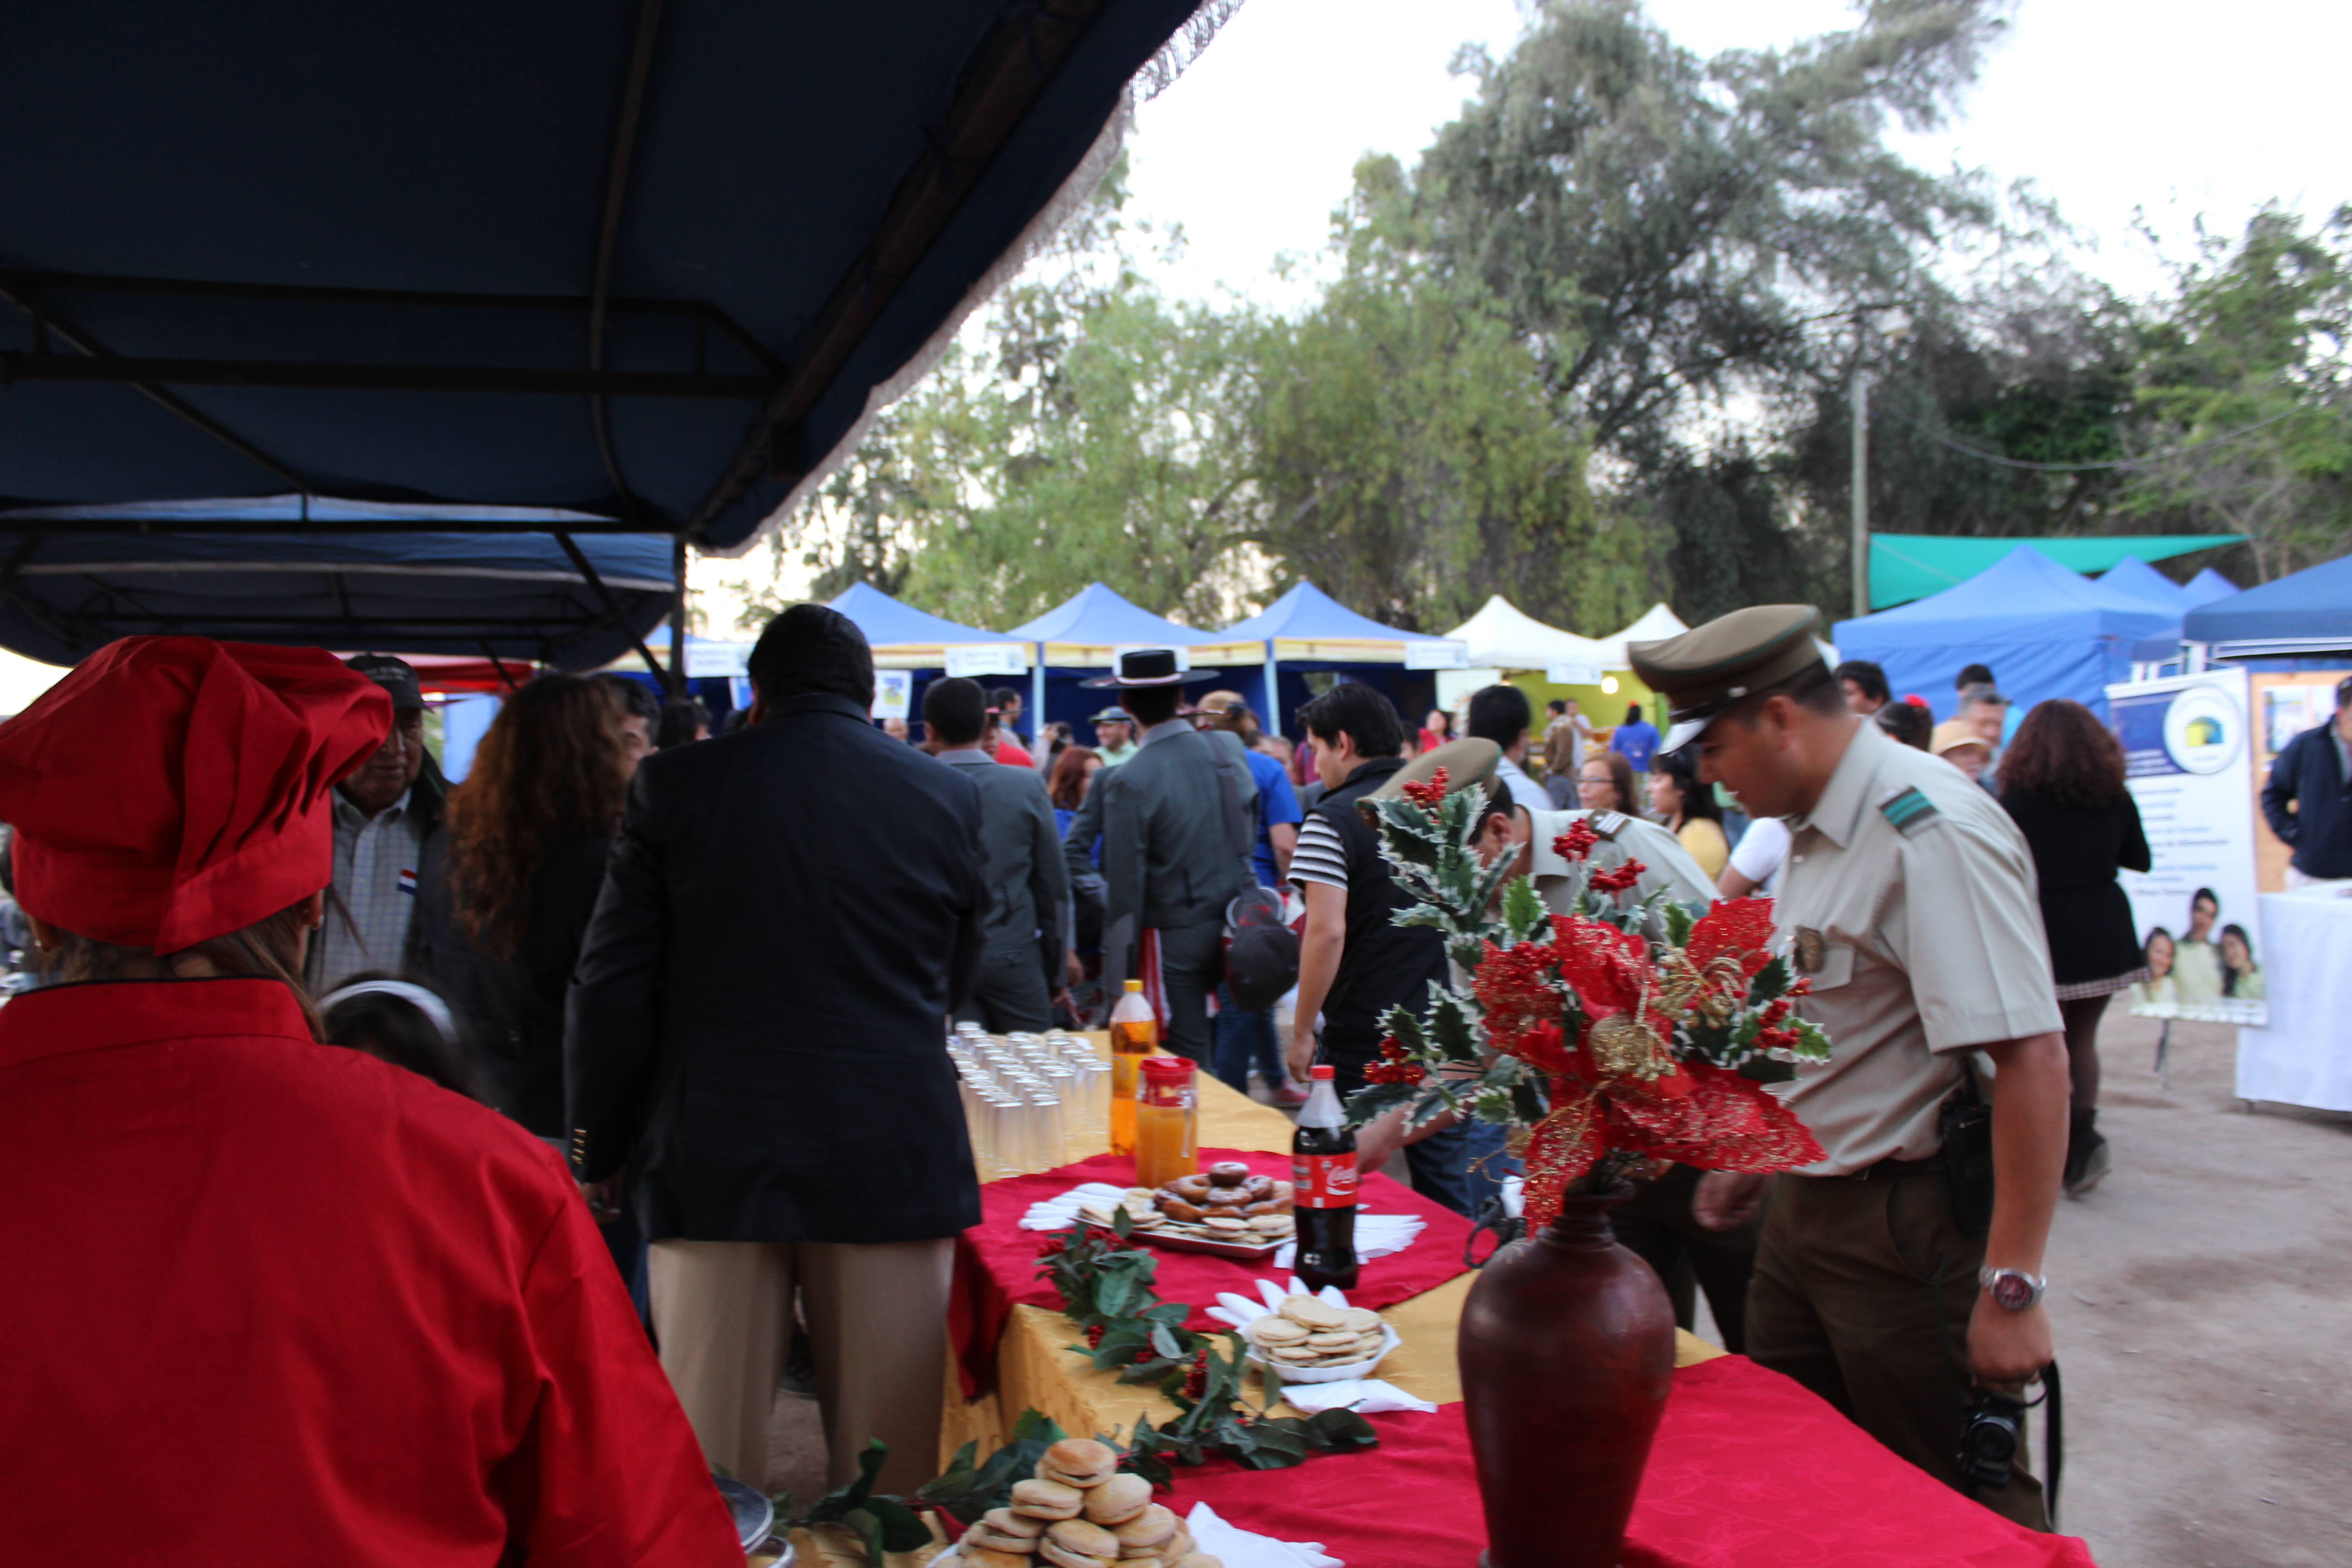 Este sábado comienza XV versión de Expo Silvoagropecuaria en Vallenar